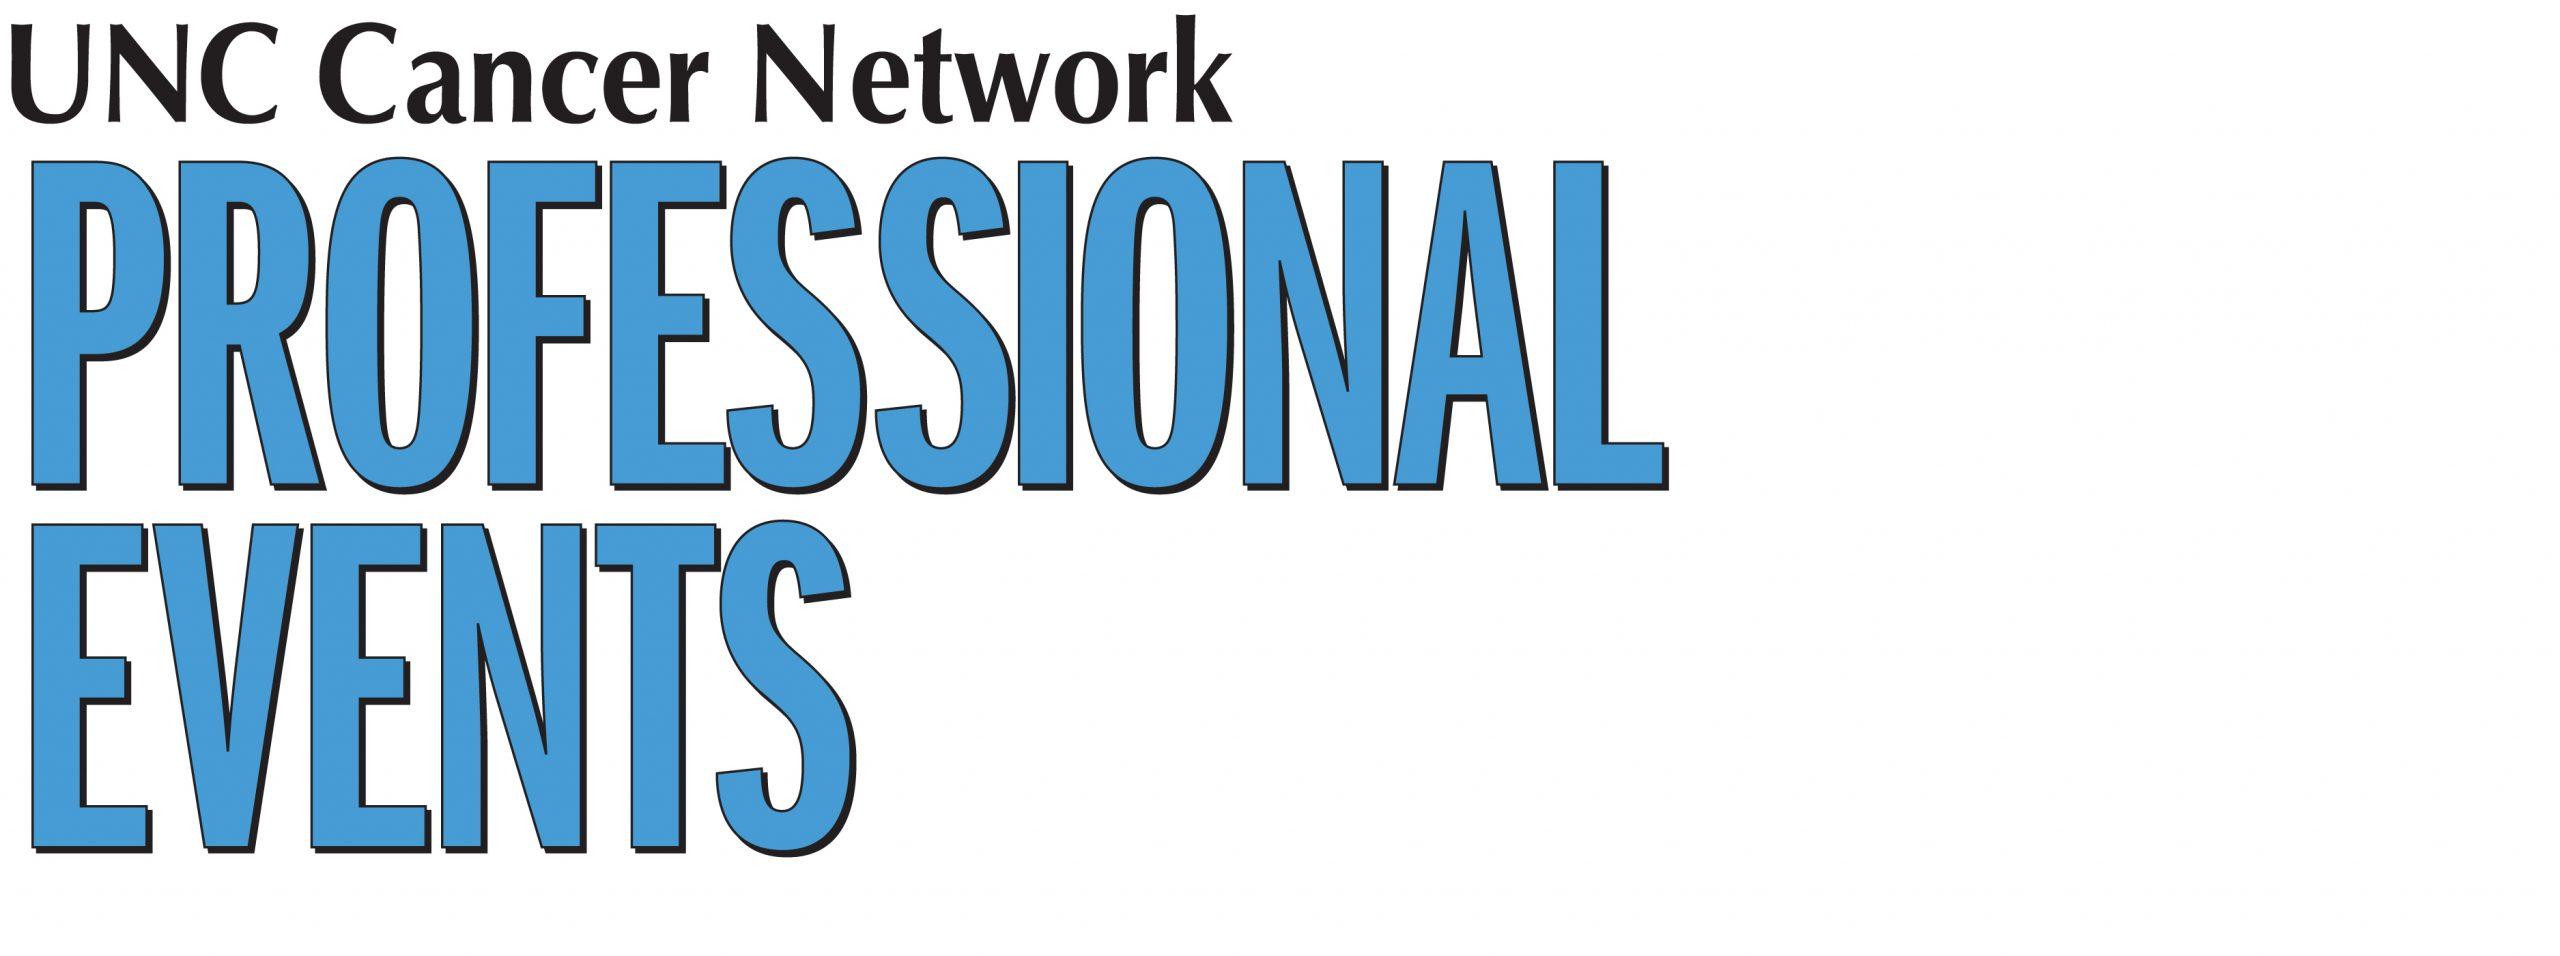 UNCCN Professional Events